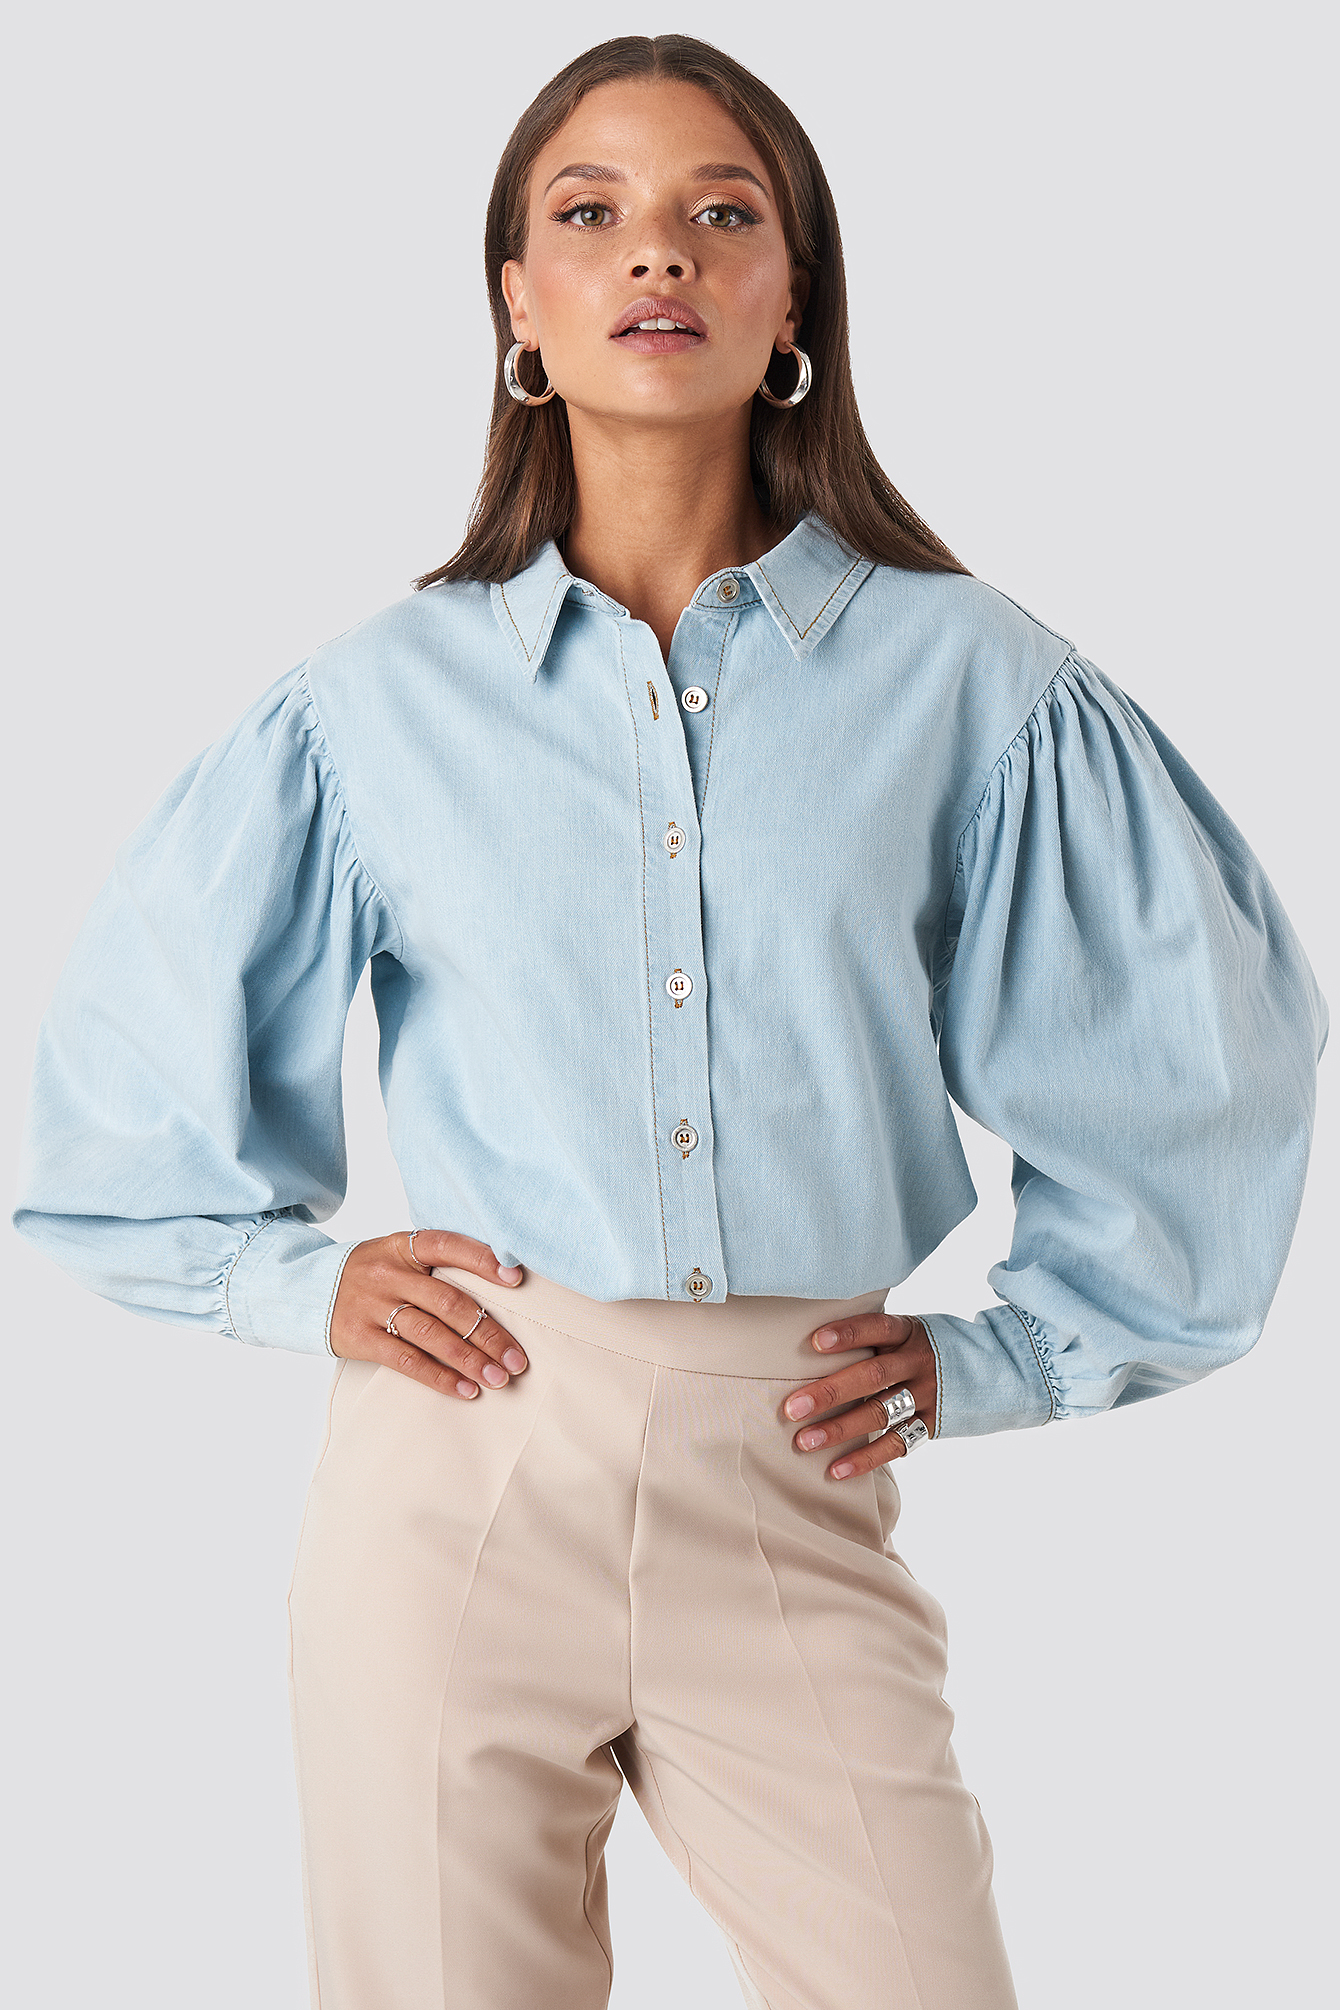 Puff sleeved denim shirt - Autumn/Winter 2019 must-haves